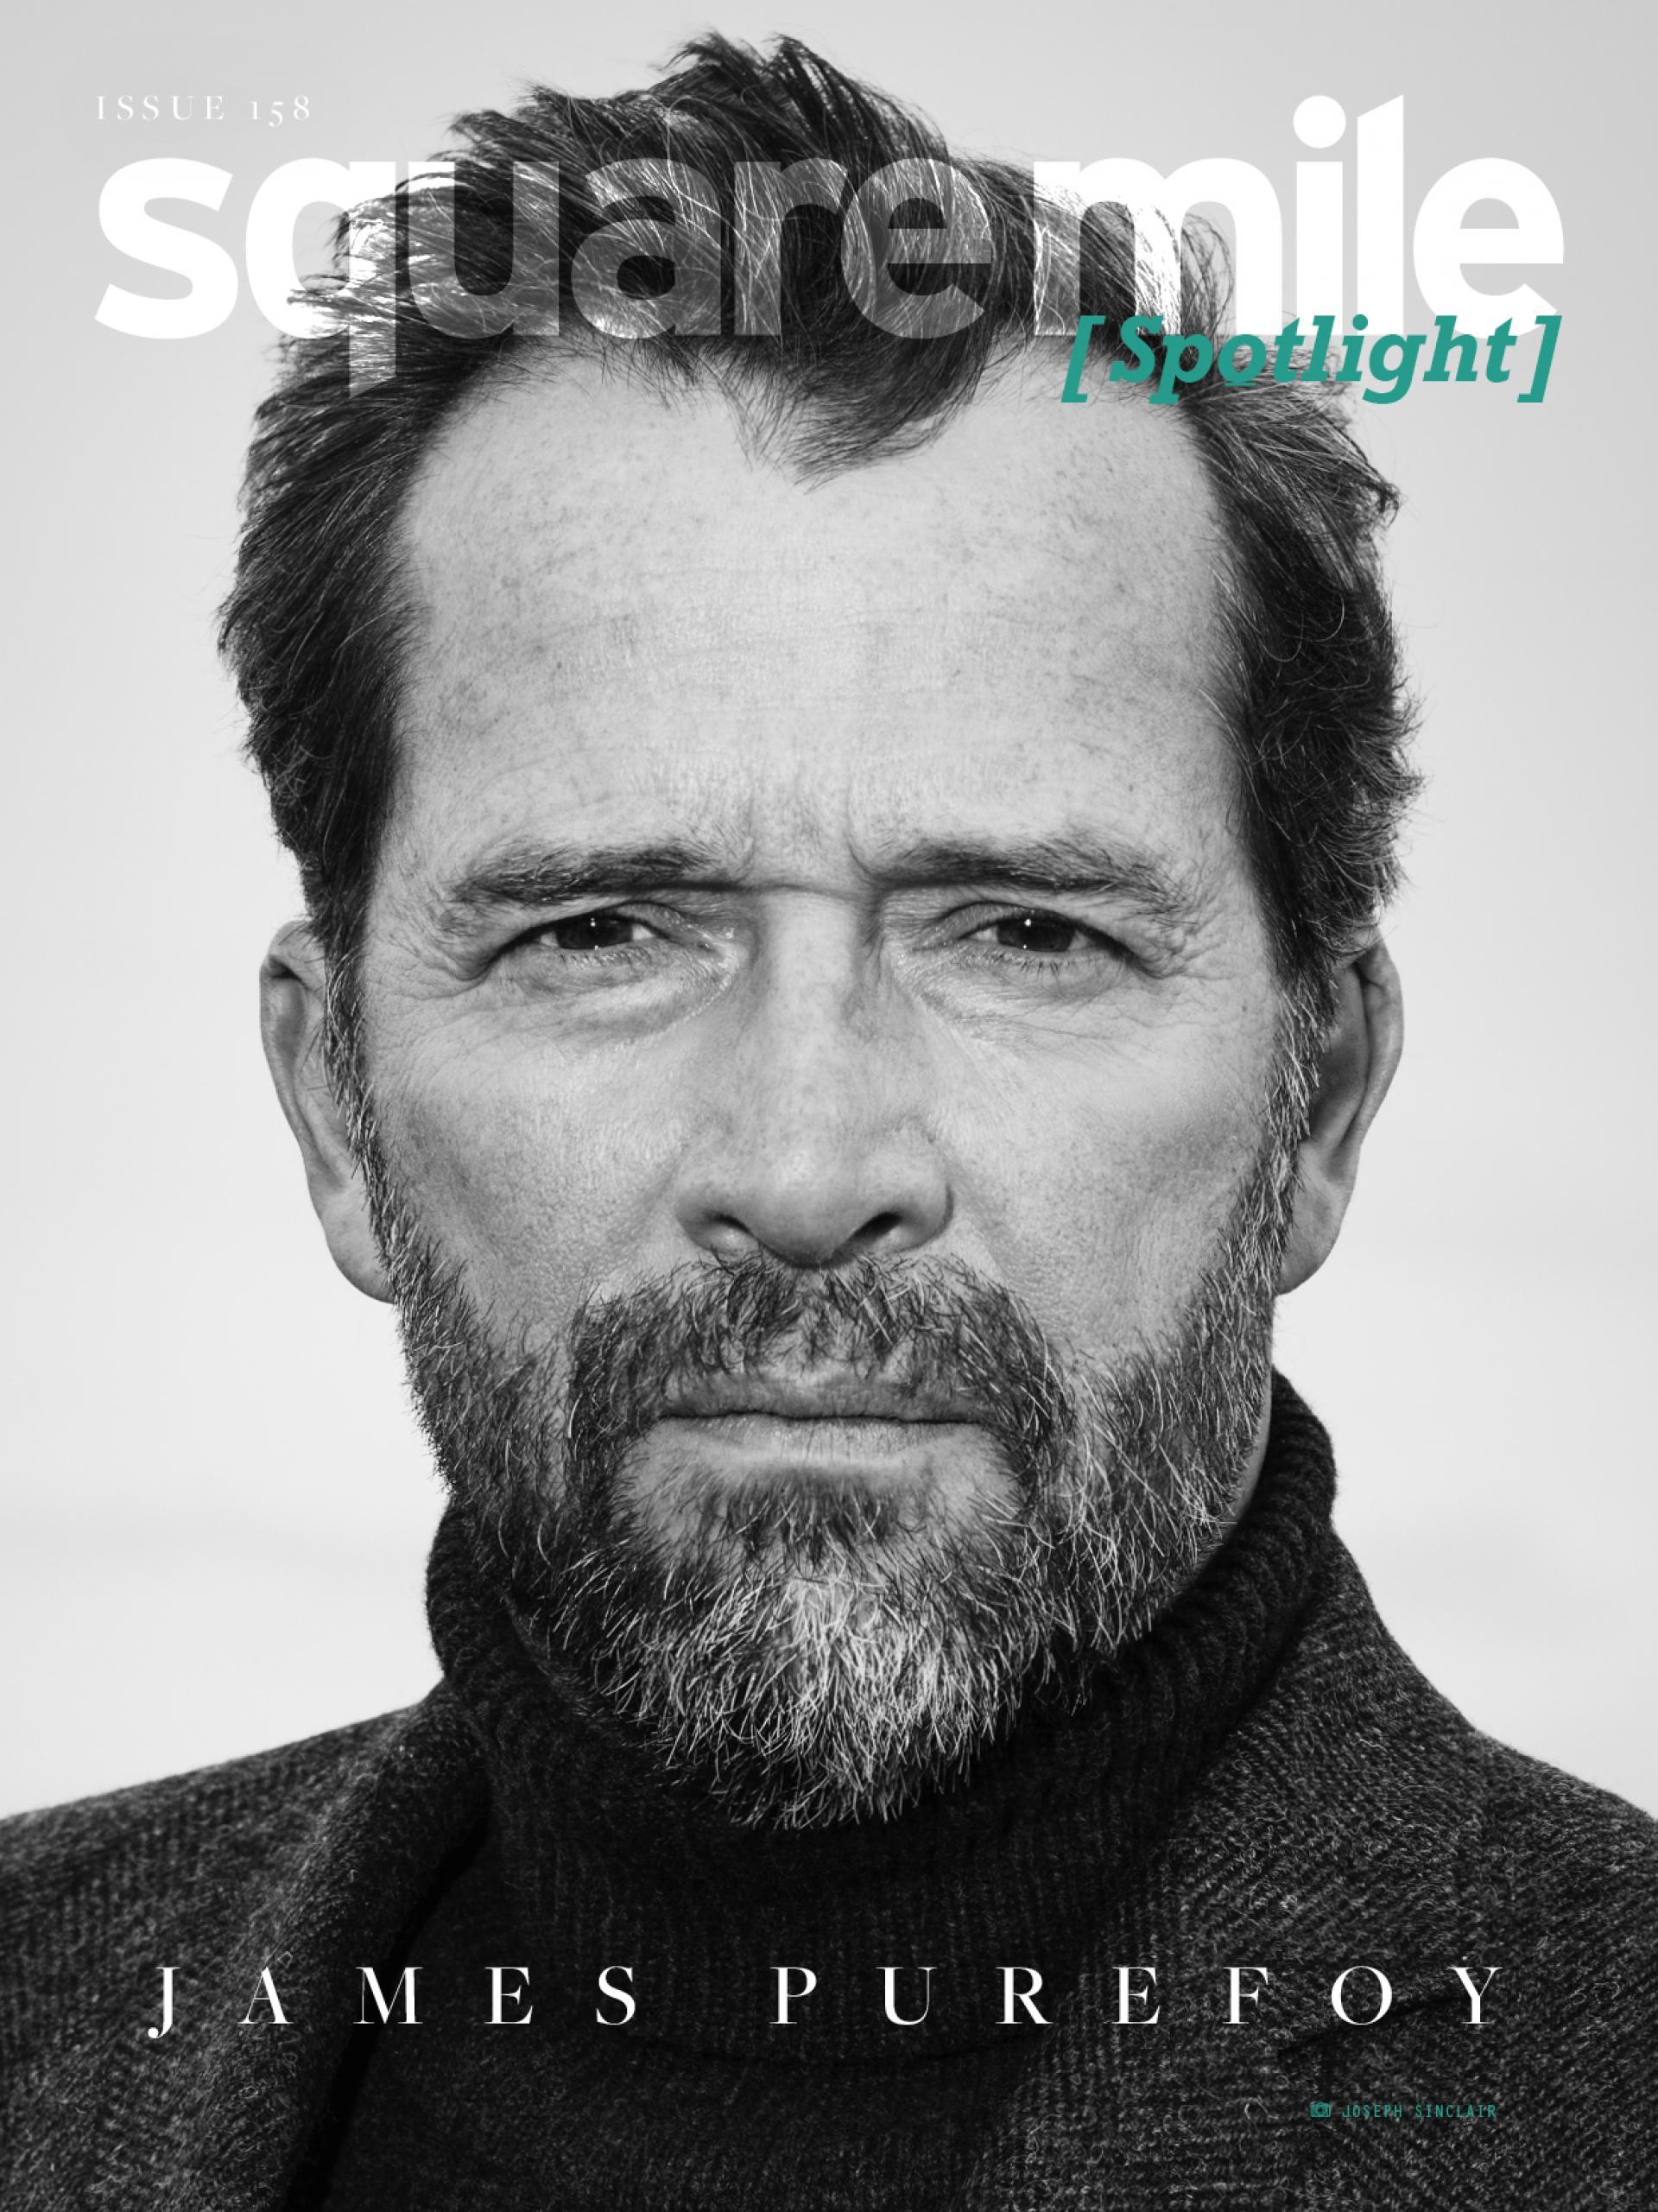 James Purefoy Square Mile Spotlight Cover